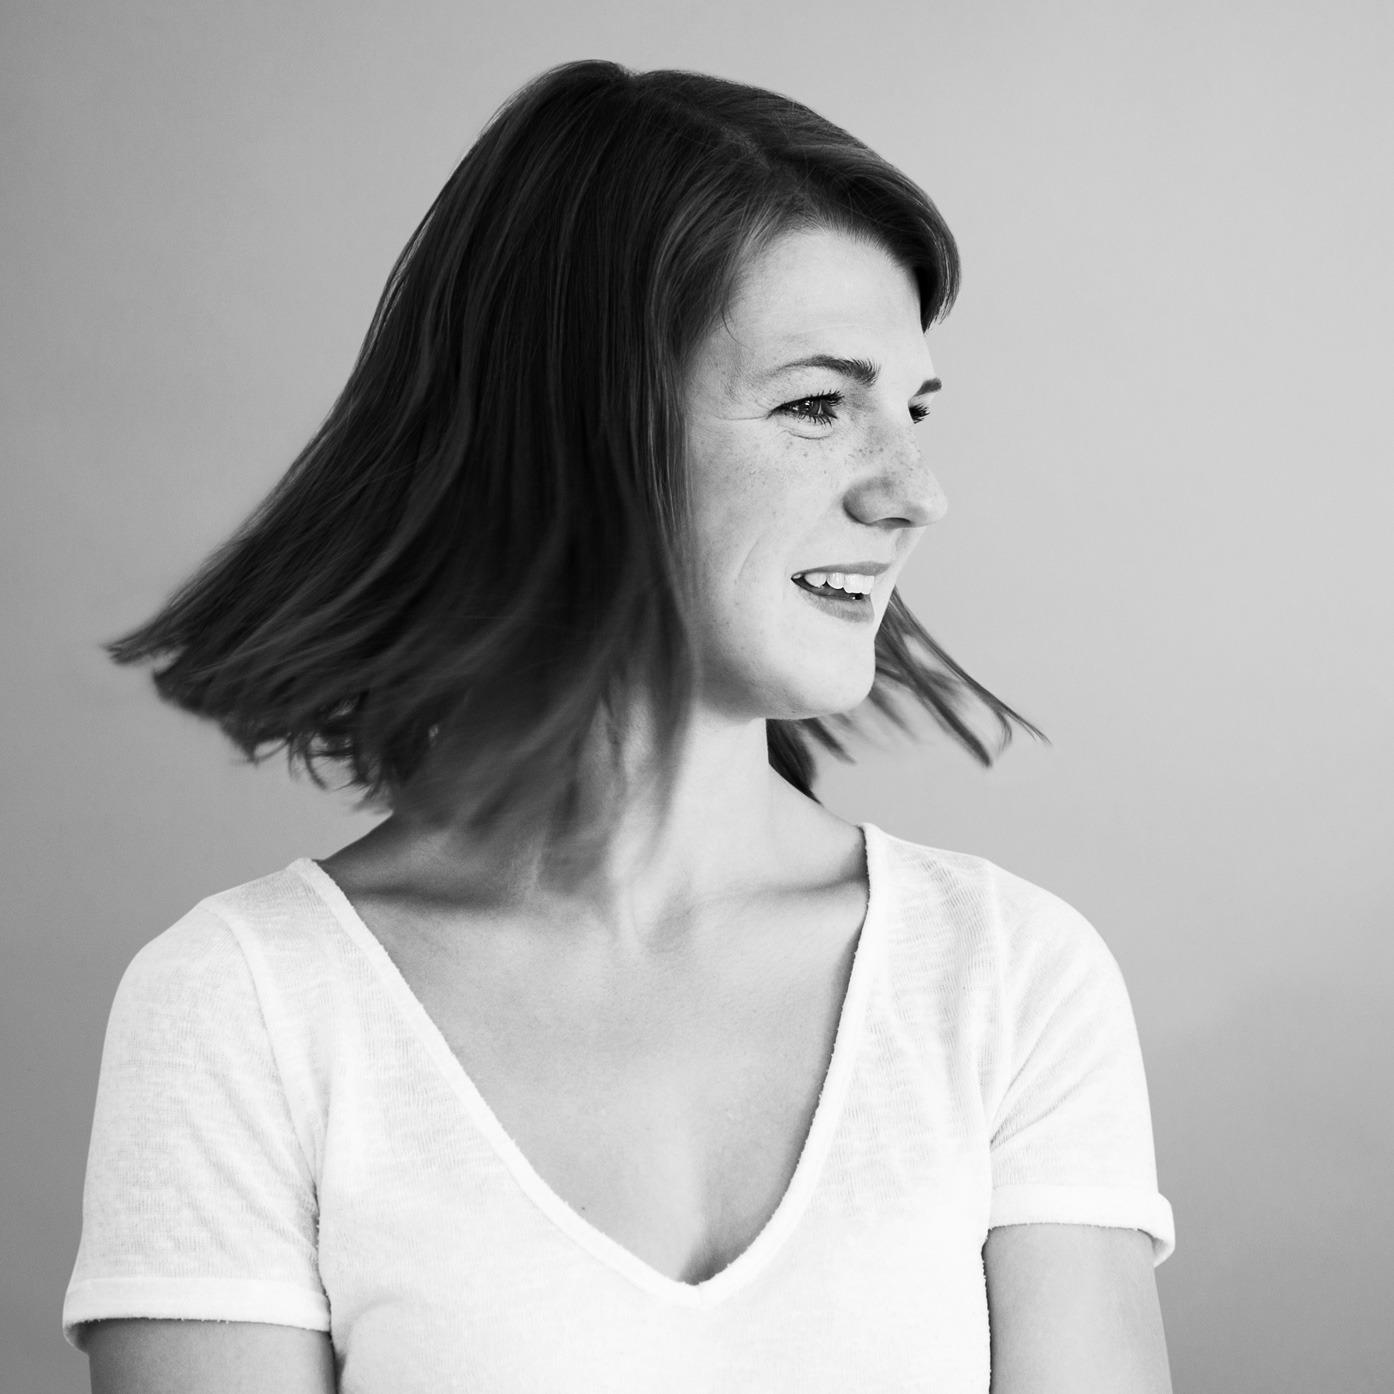 Annika Hummel